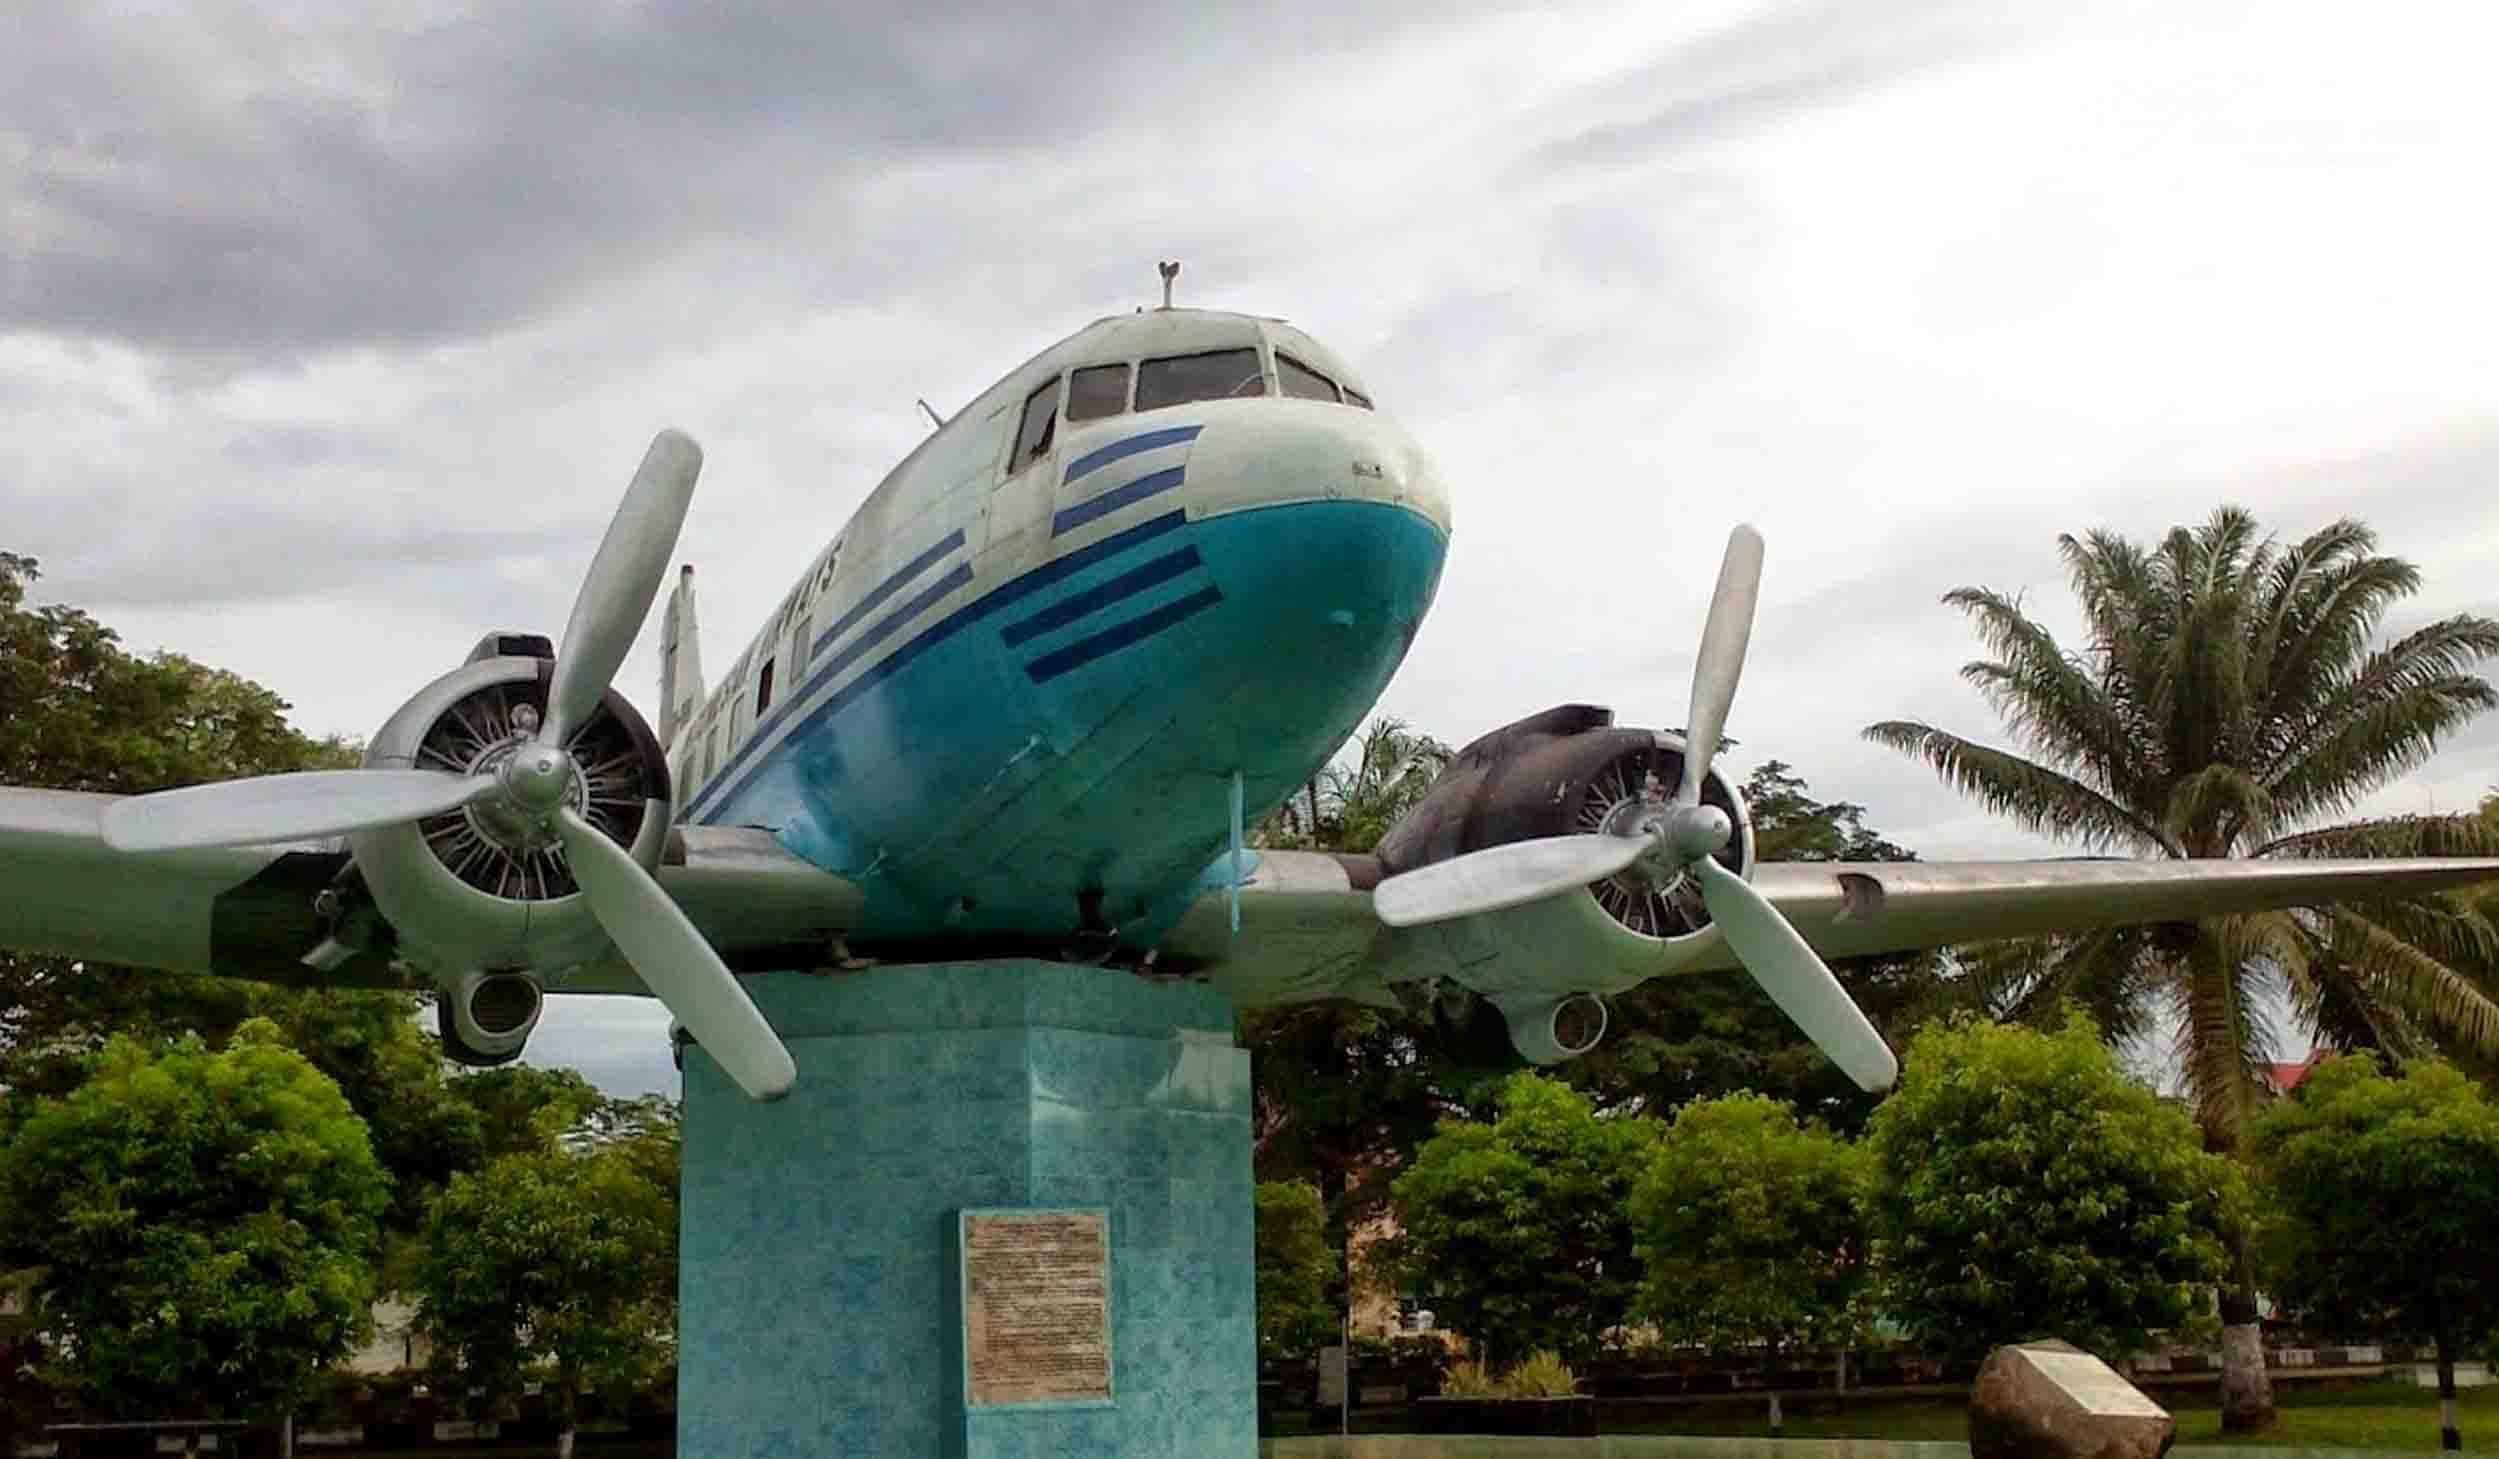 Pesawat Sumbangan Rakyat Aceh Cikal Bakal Garuda Indonesia Ri 001